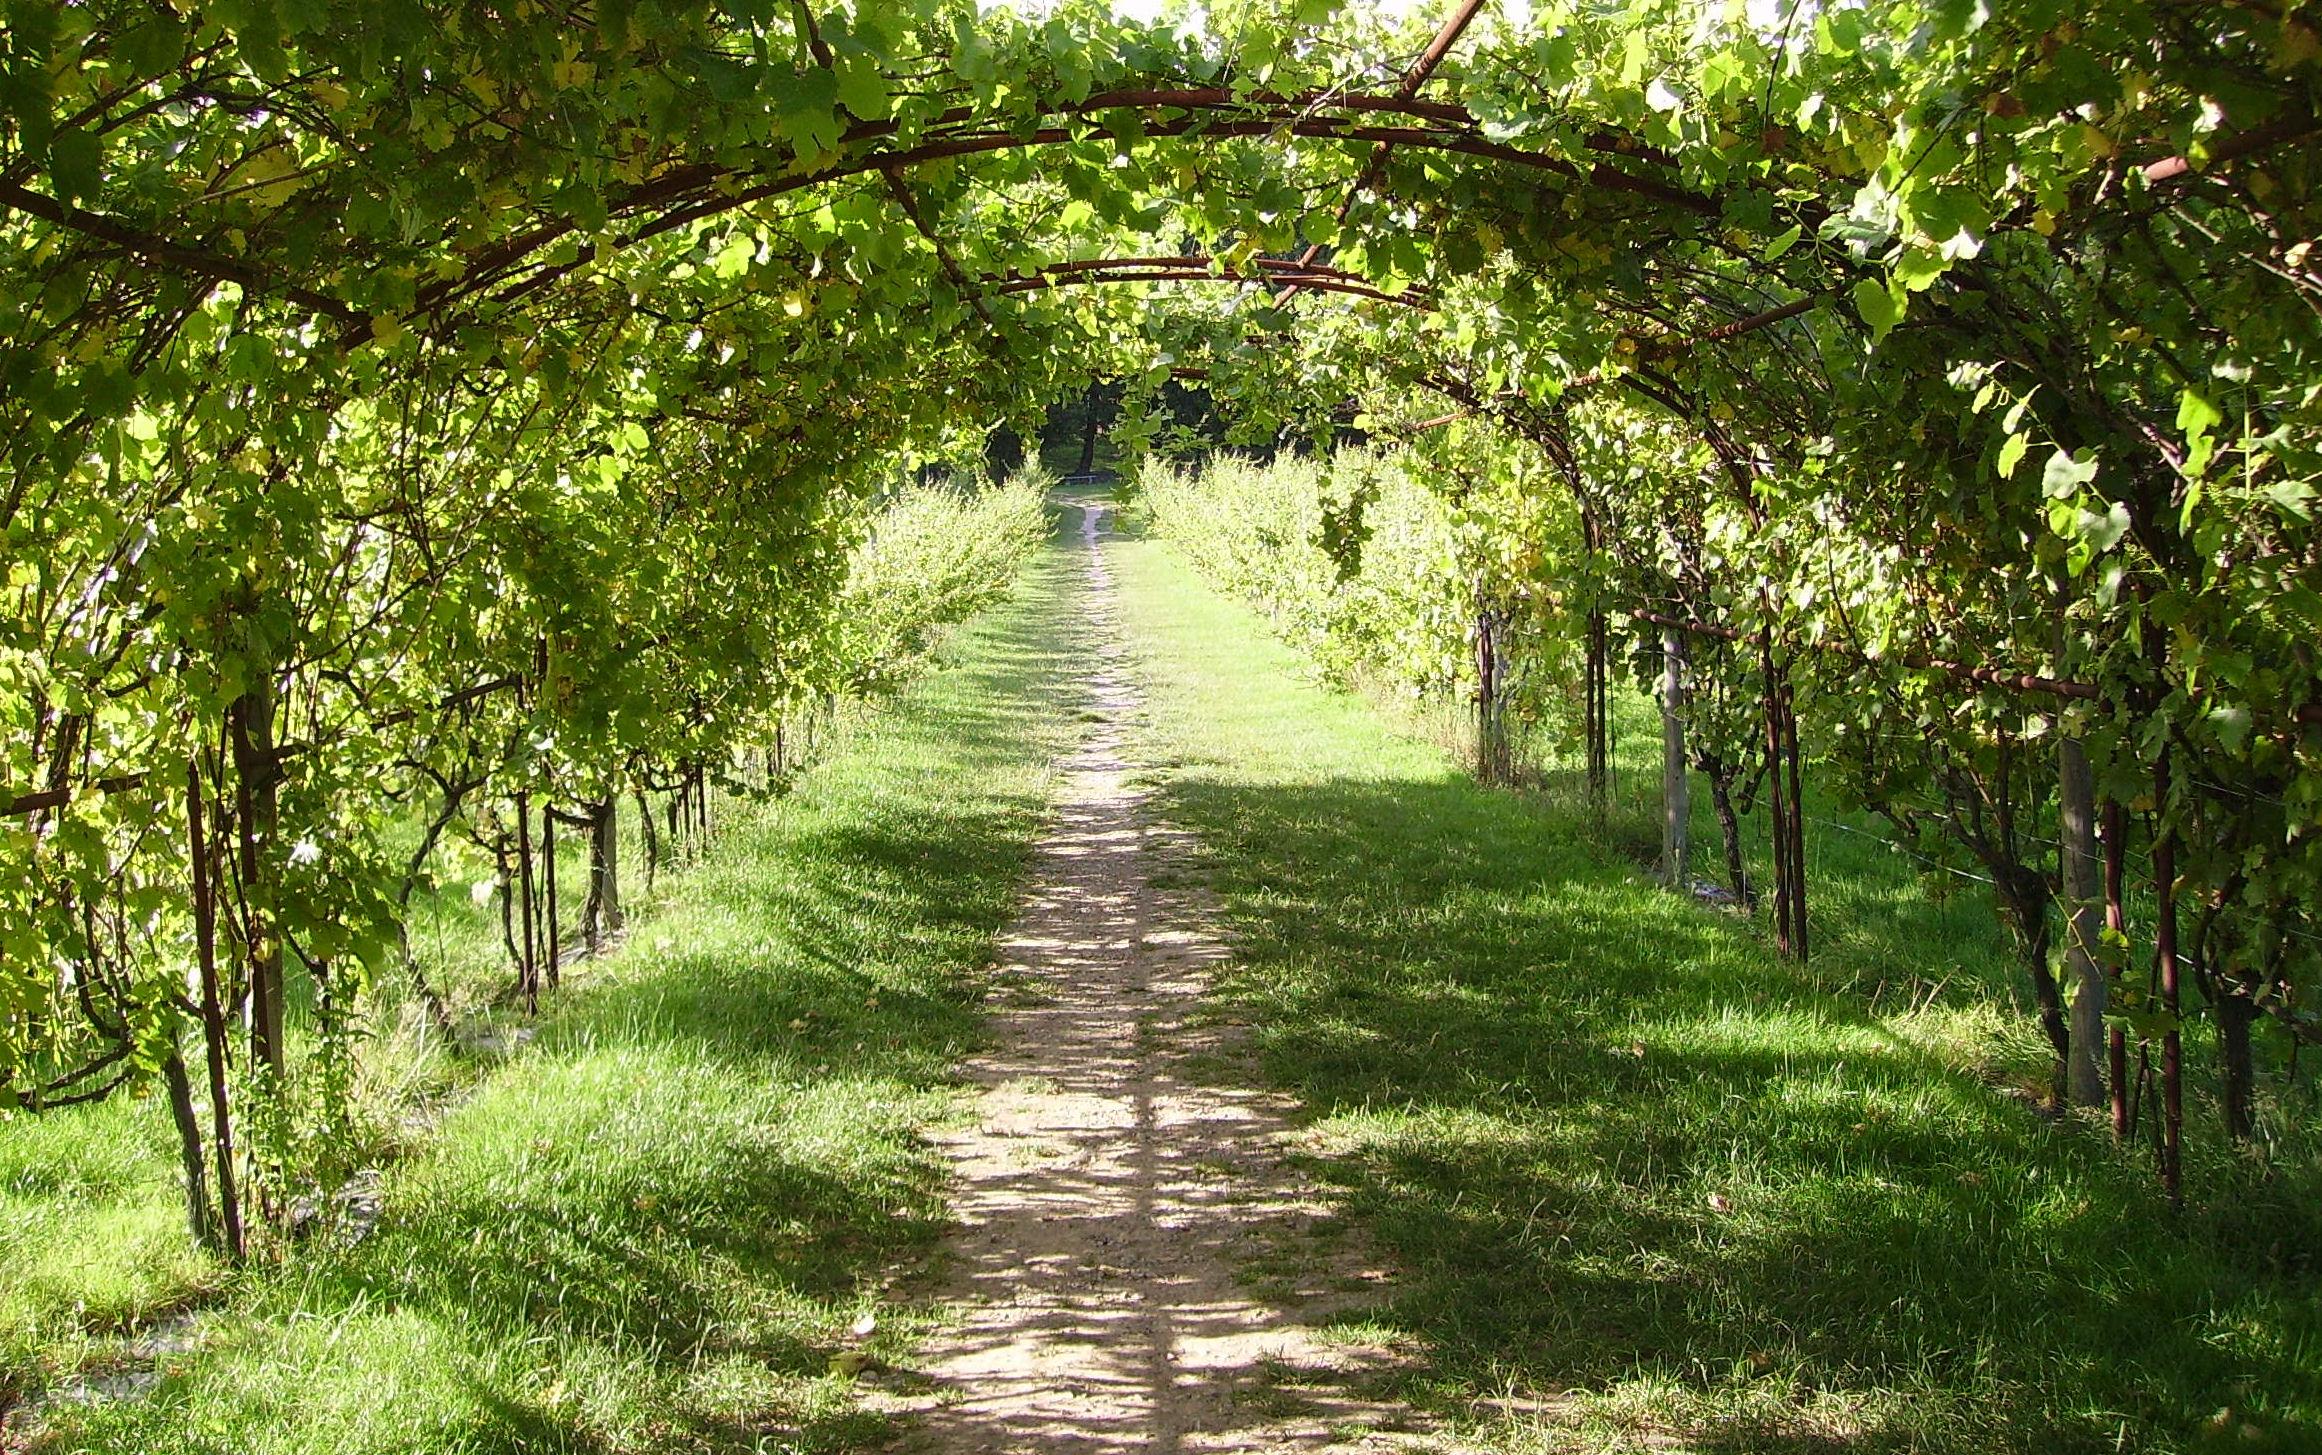 Виноградная арка своими руками фото